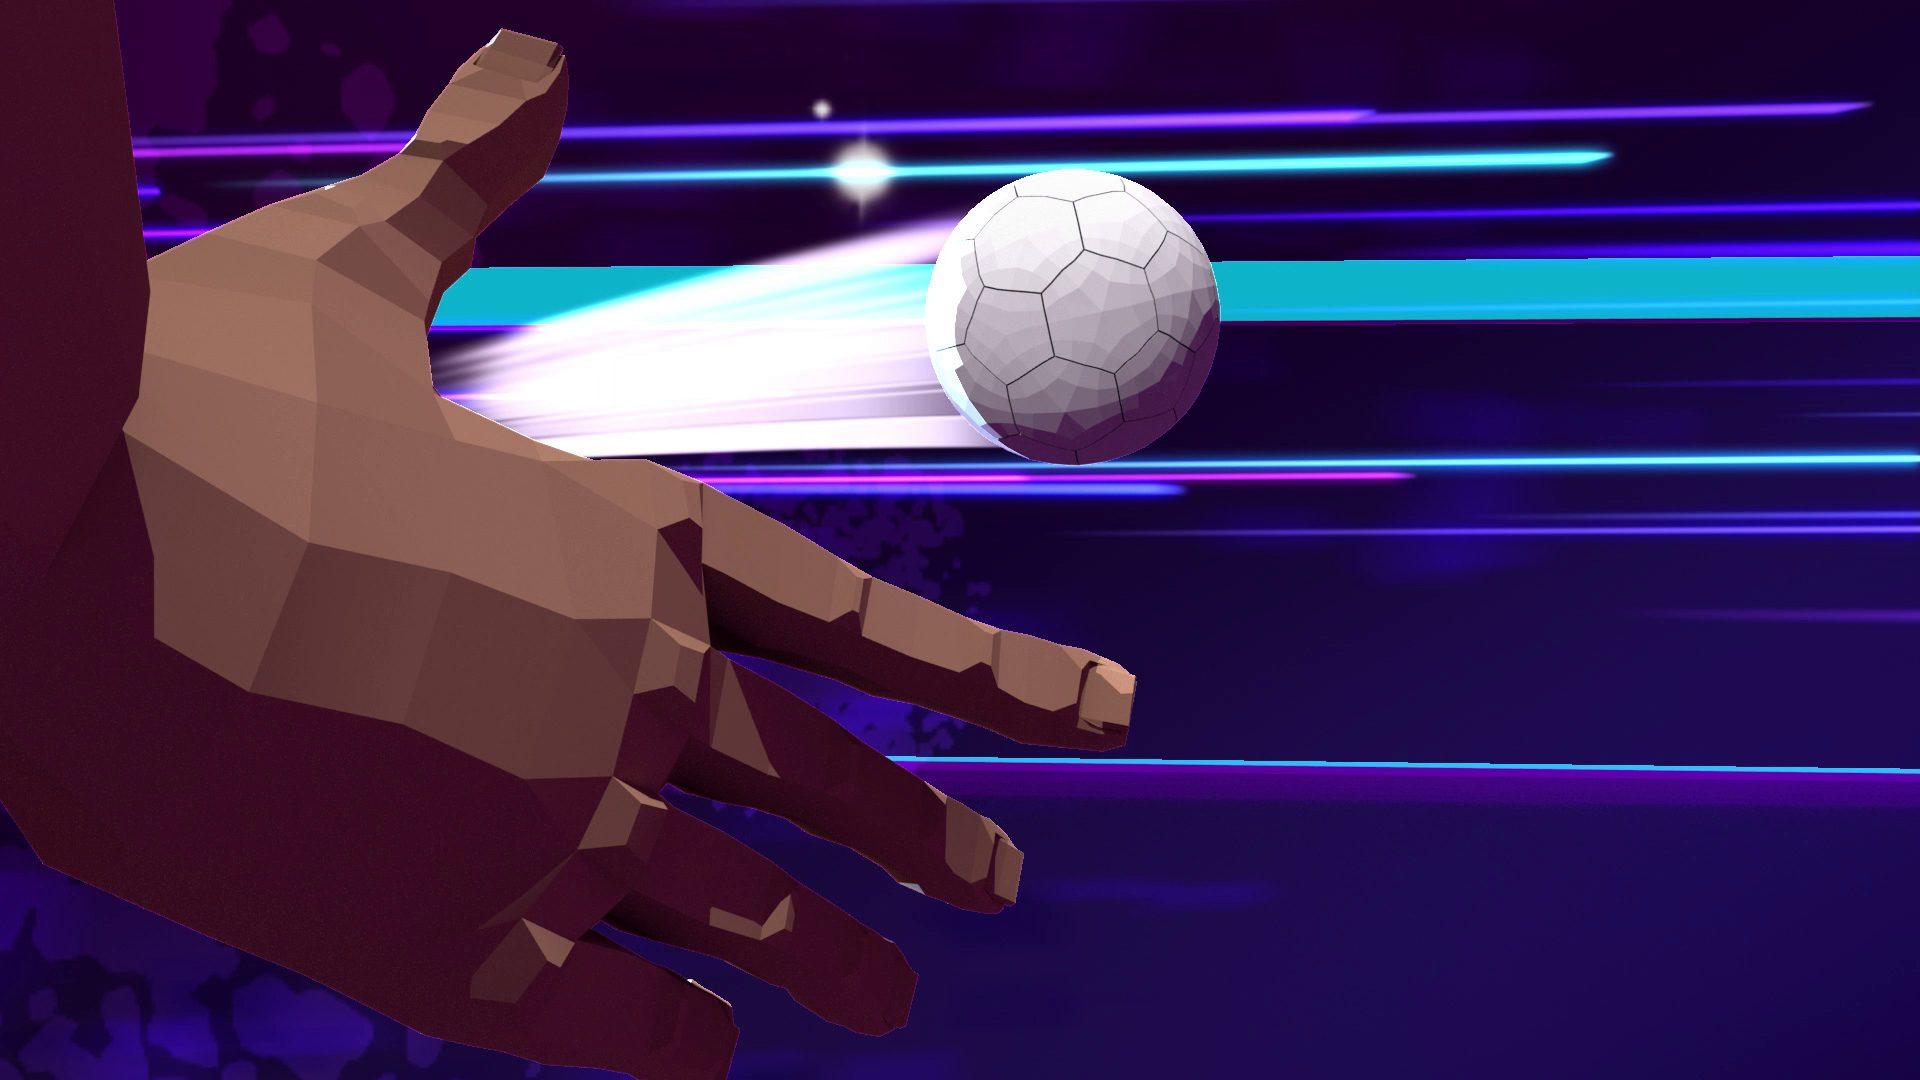 EHF_2022_lowpoly_01